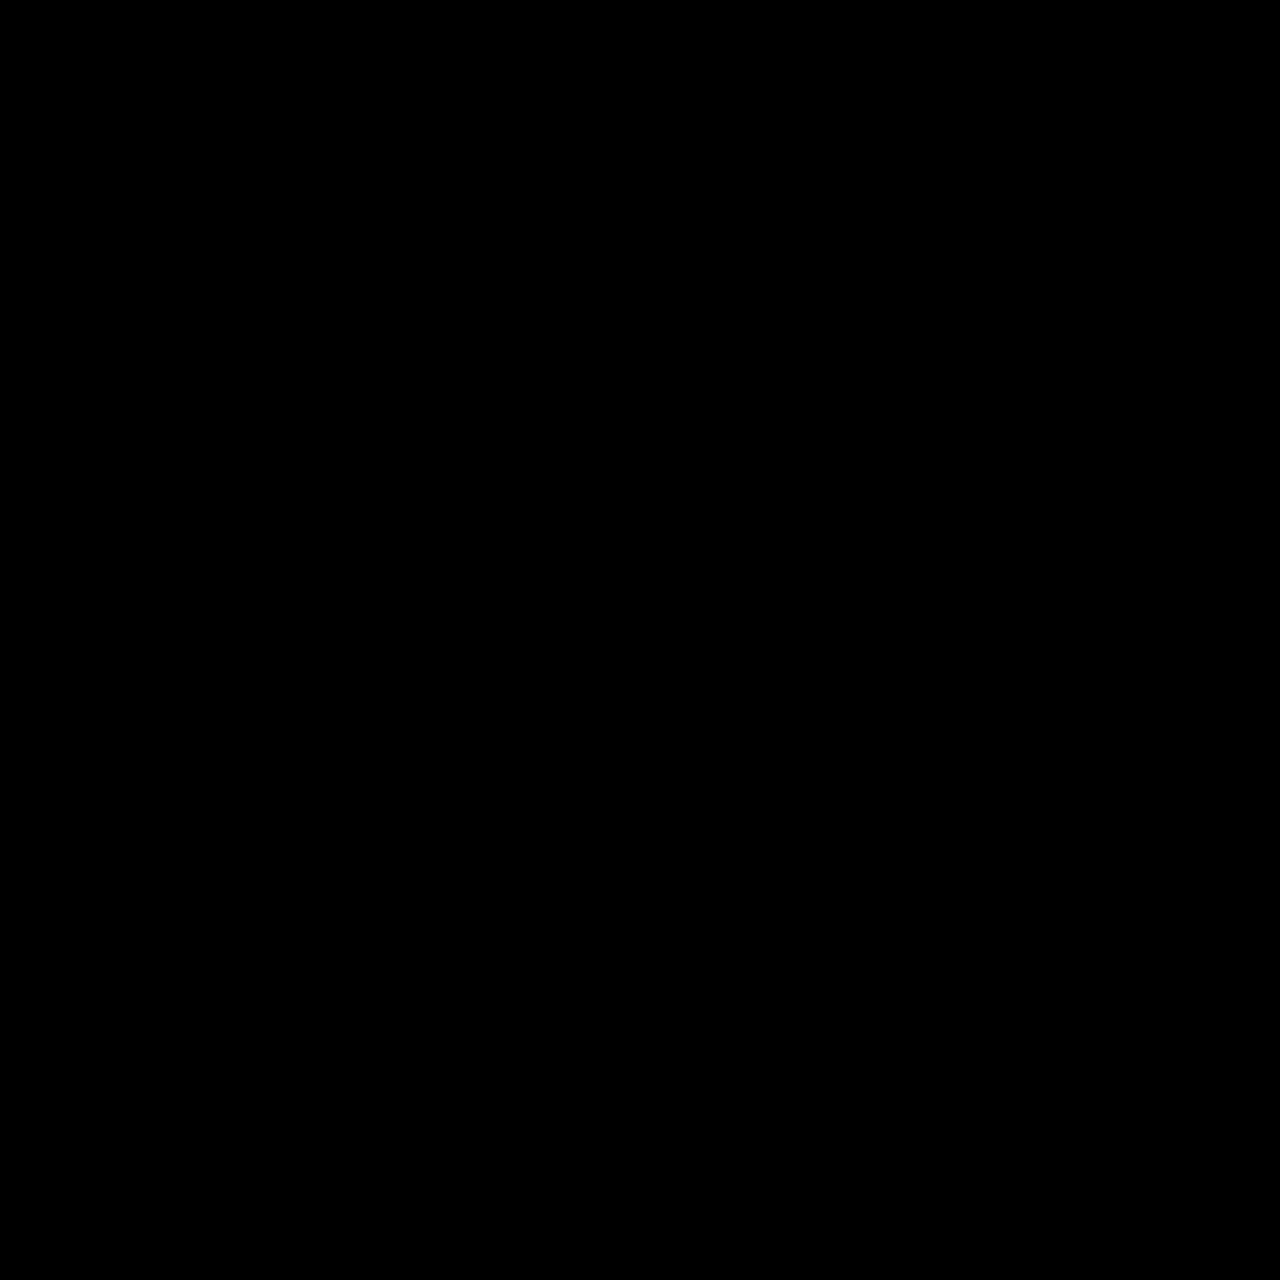 KezariLogo (1).png